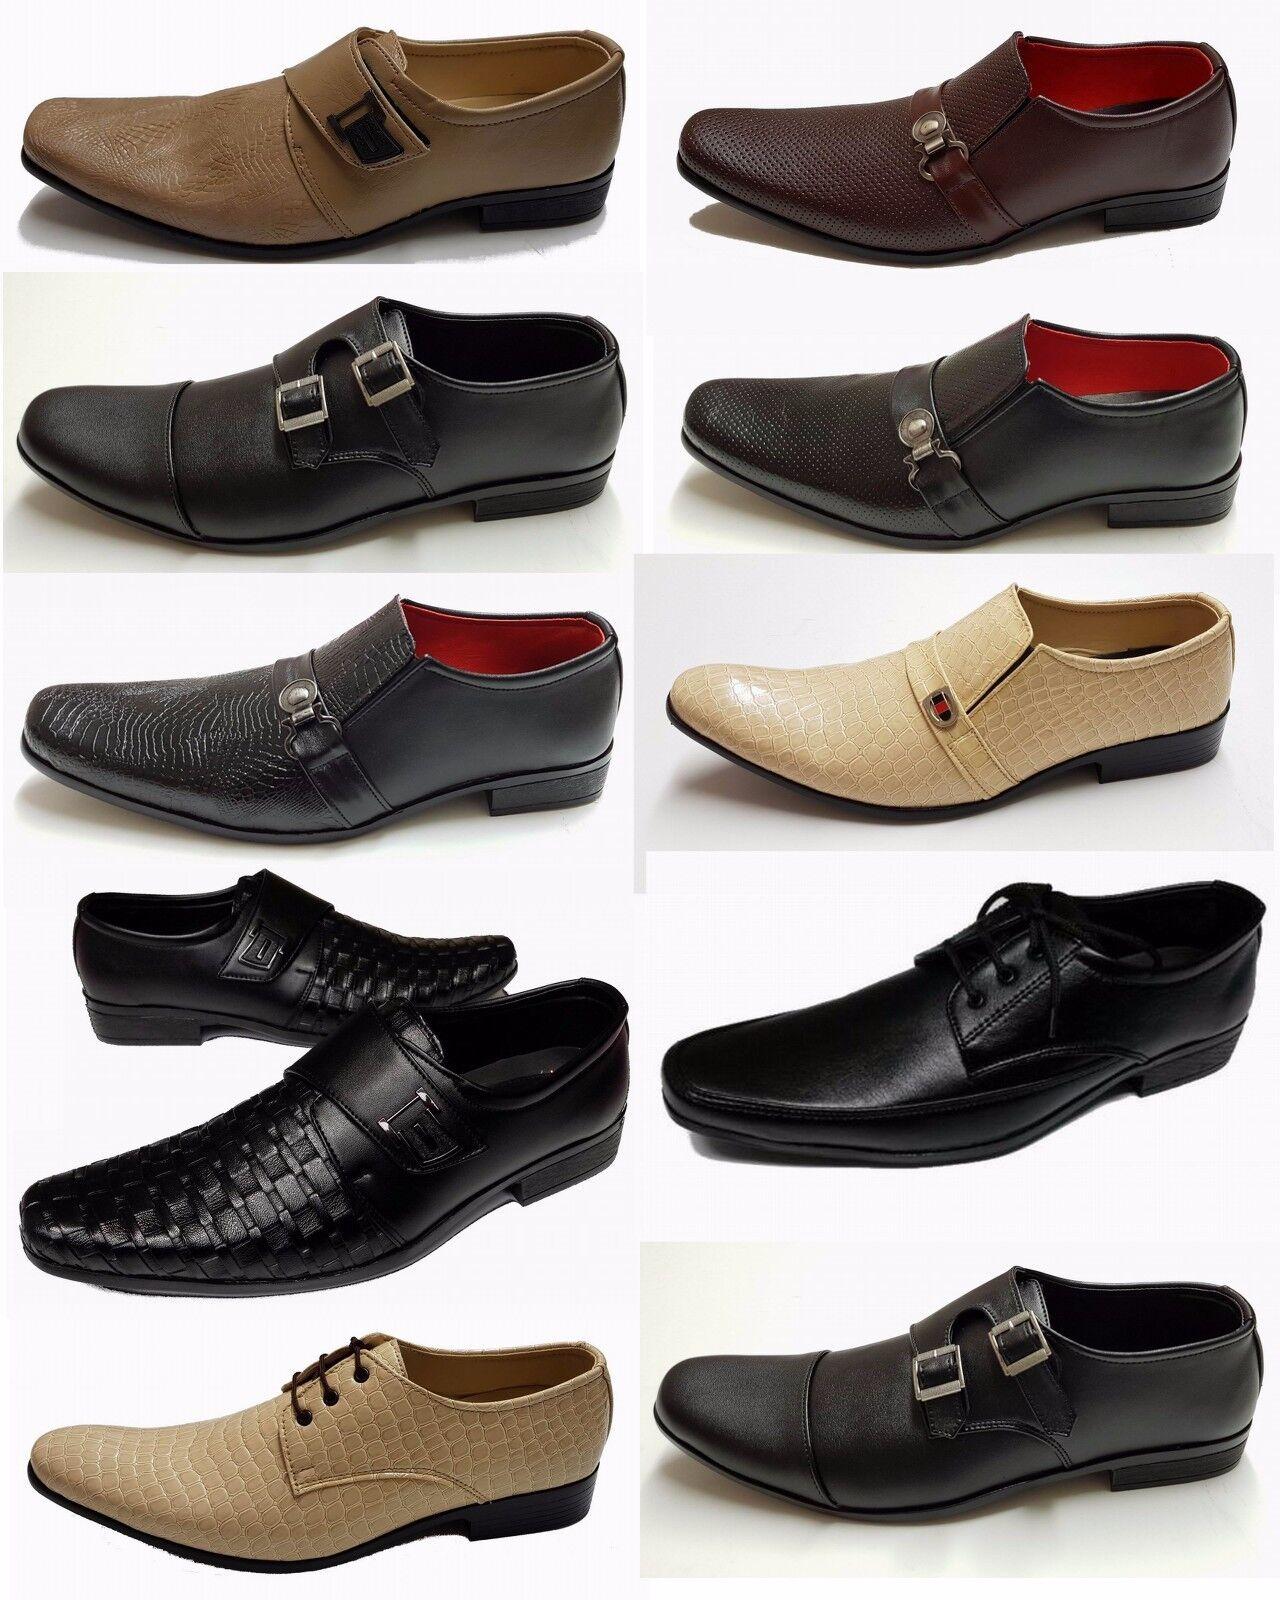 SHUMAXX MEN/'S SHOES Slip on FORMAL DRESS ITALIAN STYLE MEN BOY/'S SHOES